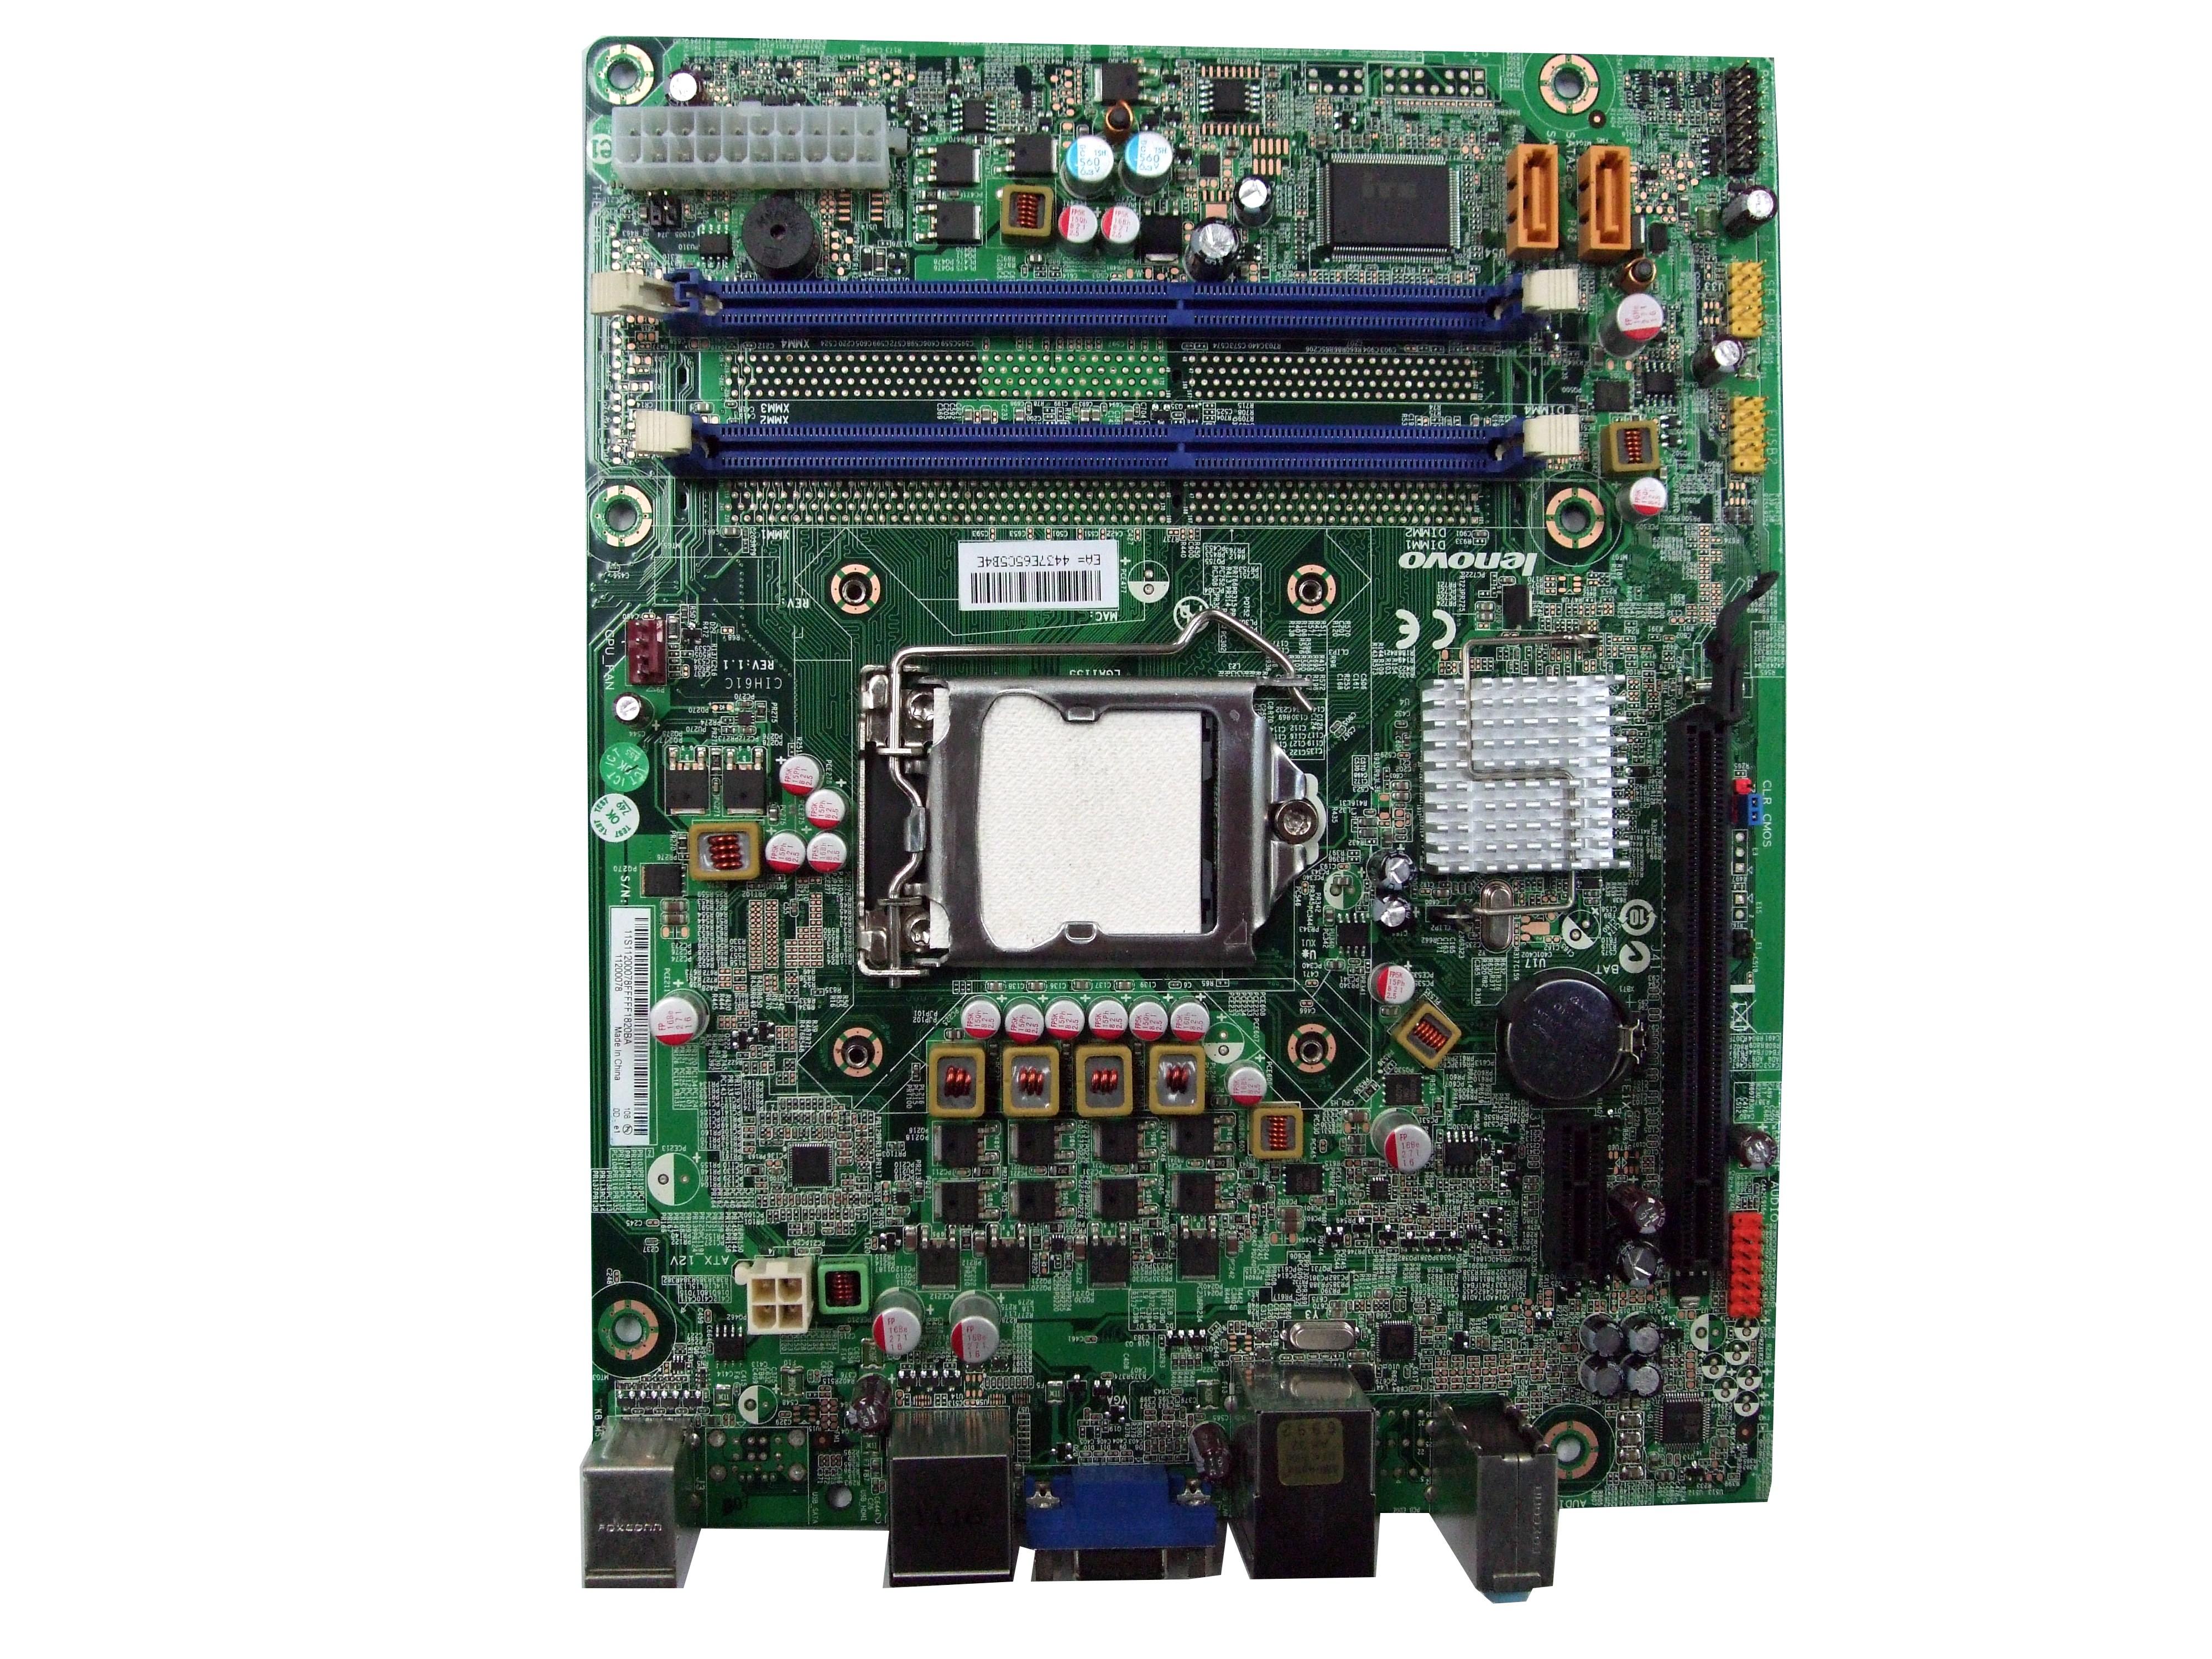 n232 motherboard manual enthusiast wiring diagrams \u2022 dc jack wiring diagram pc motherboard manual enthusiast wiring diagrams u2022 rh rasalibre co asus motherboard manuals emachines motherboard manuals